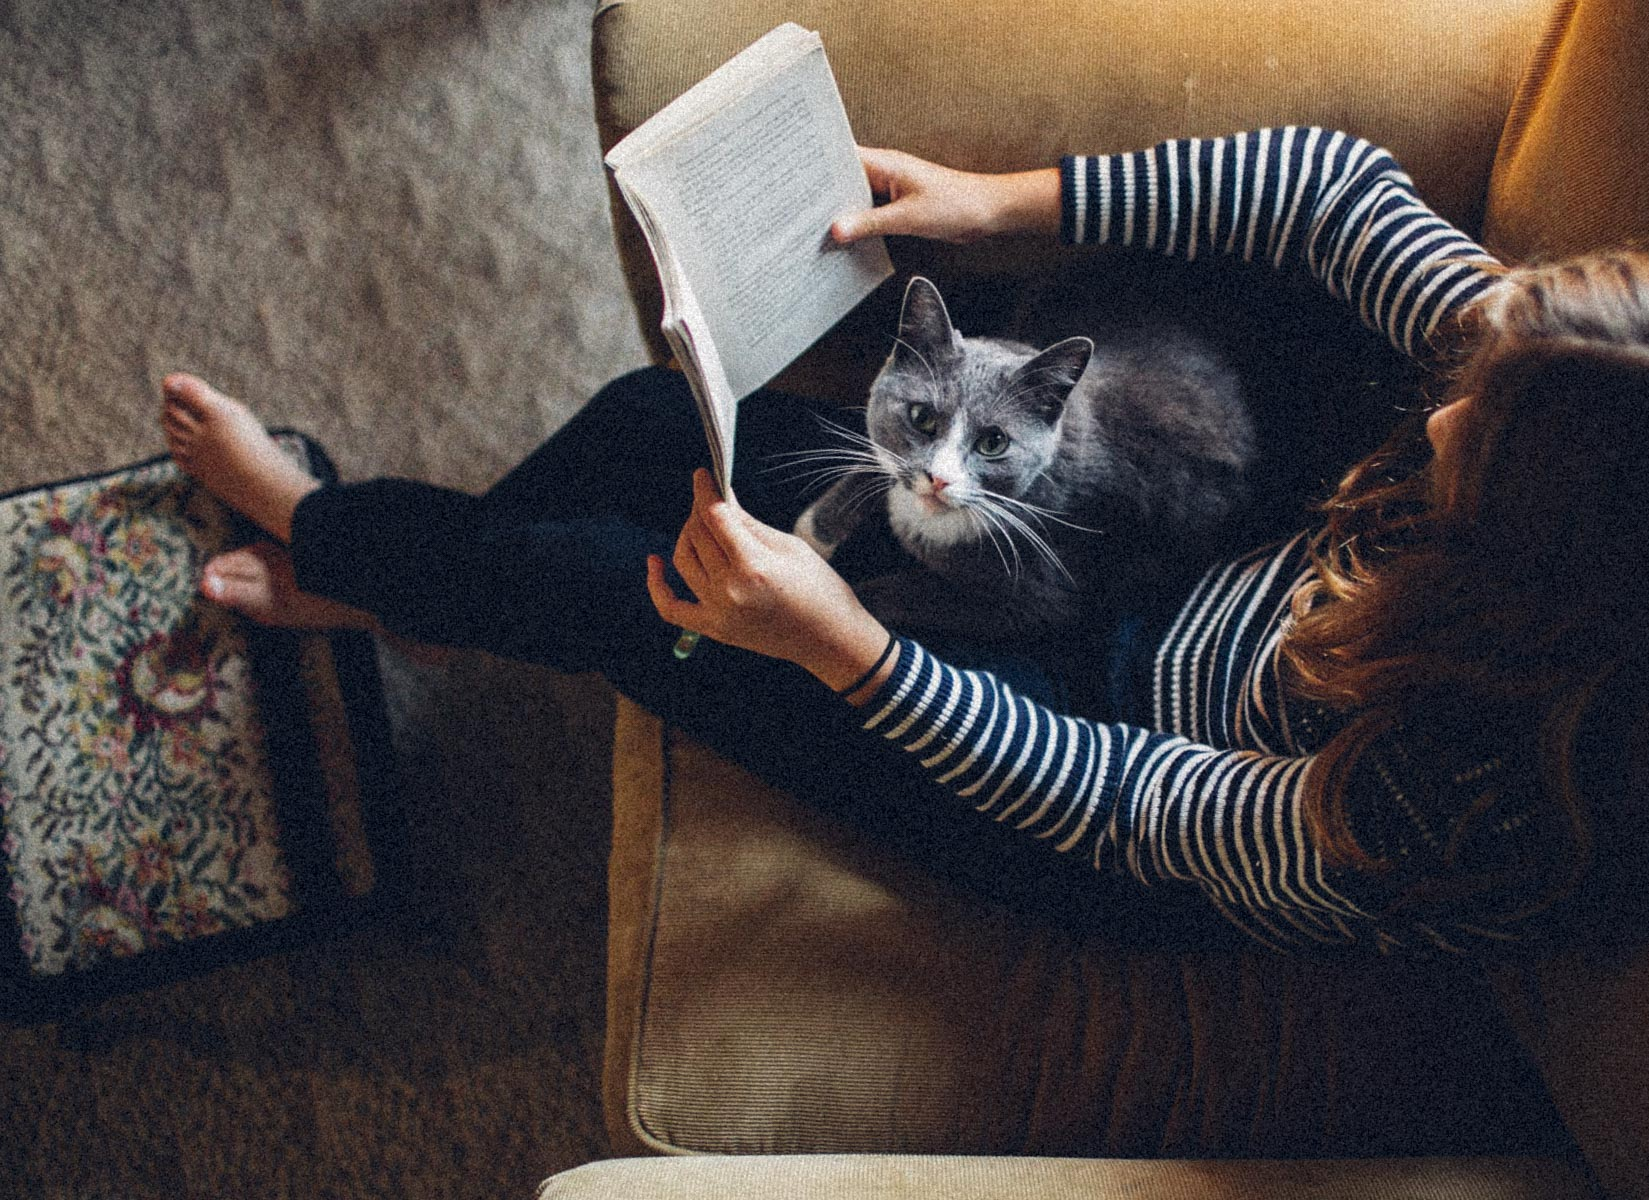 Meow-0165.jpg